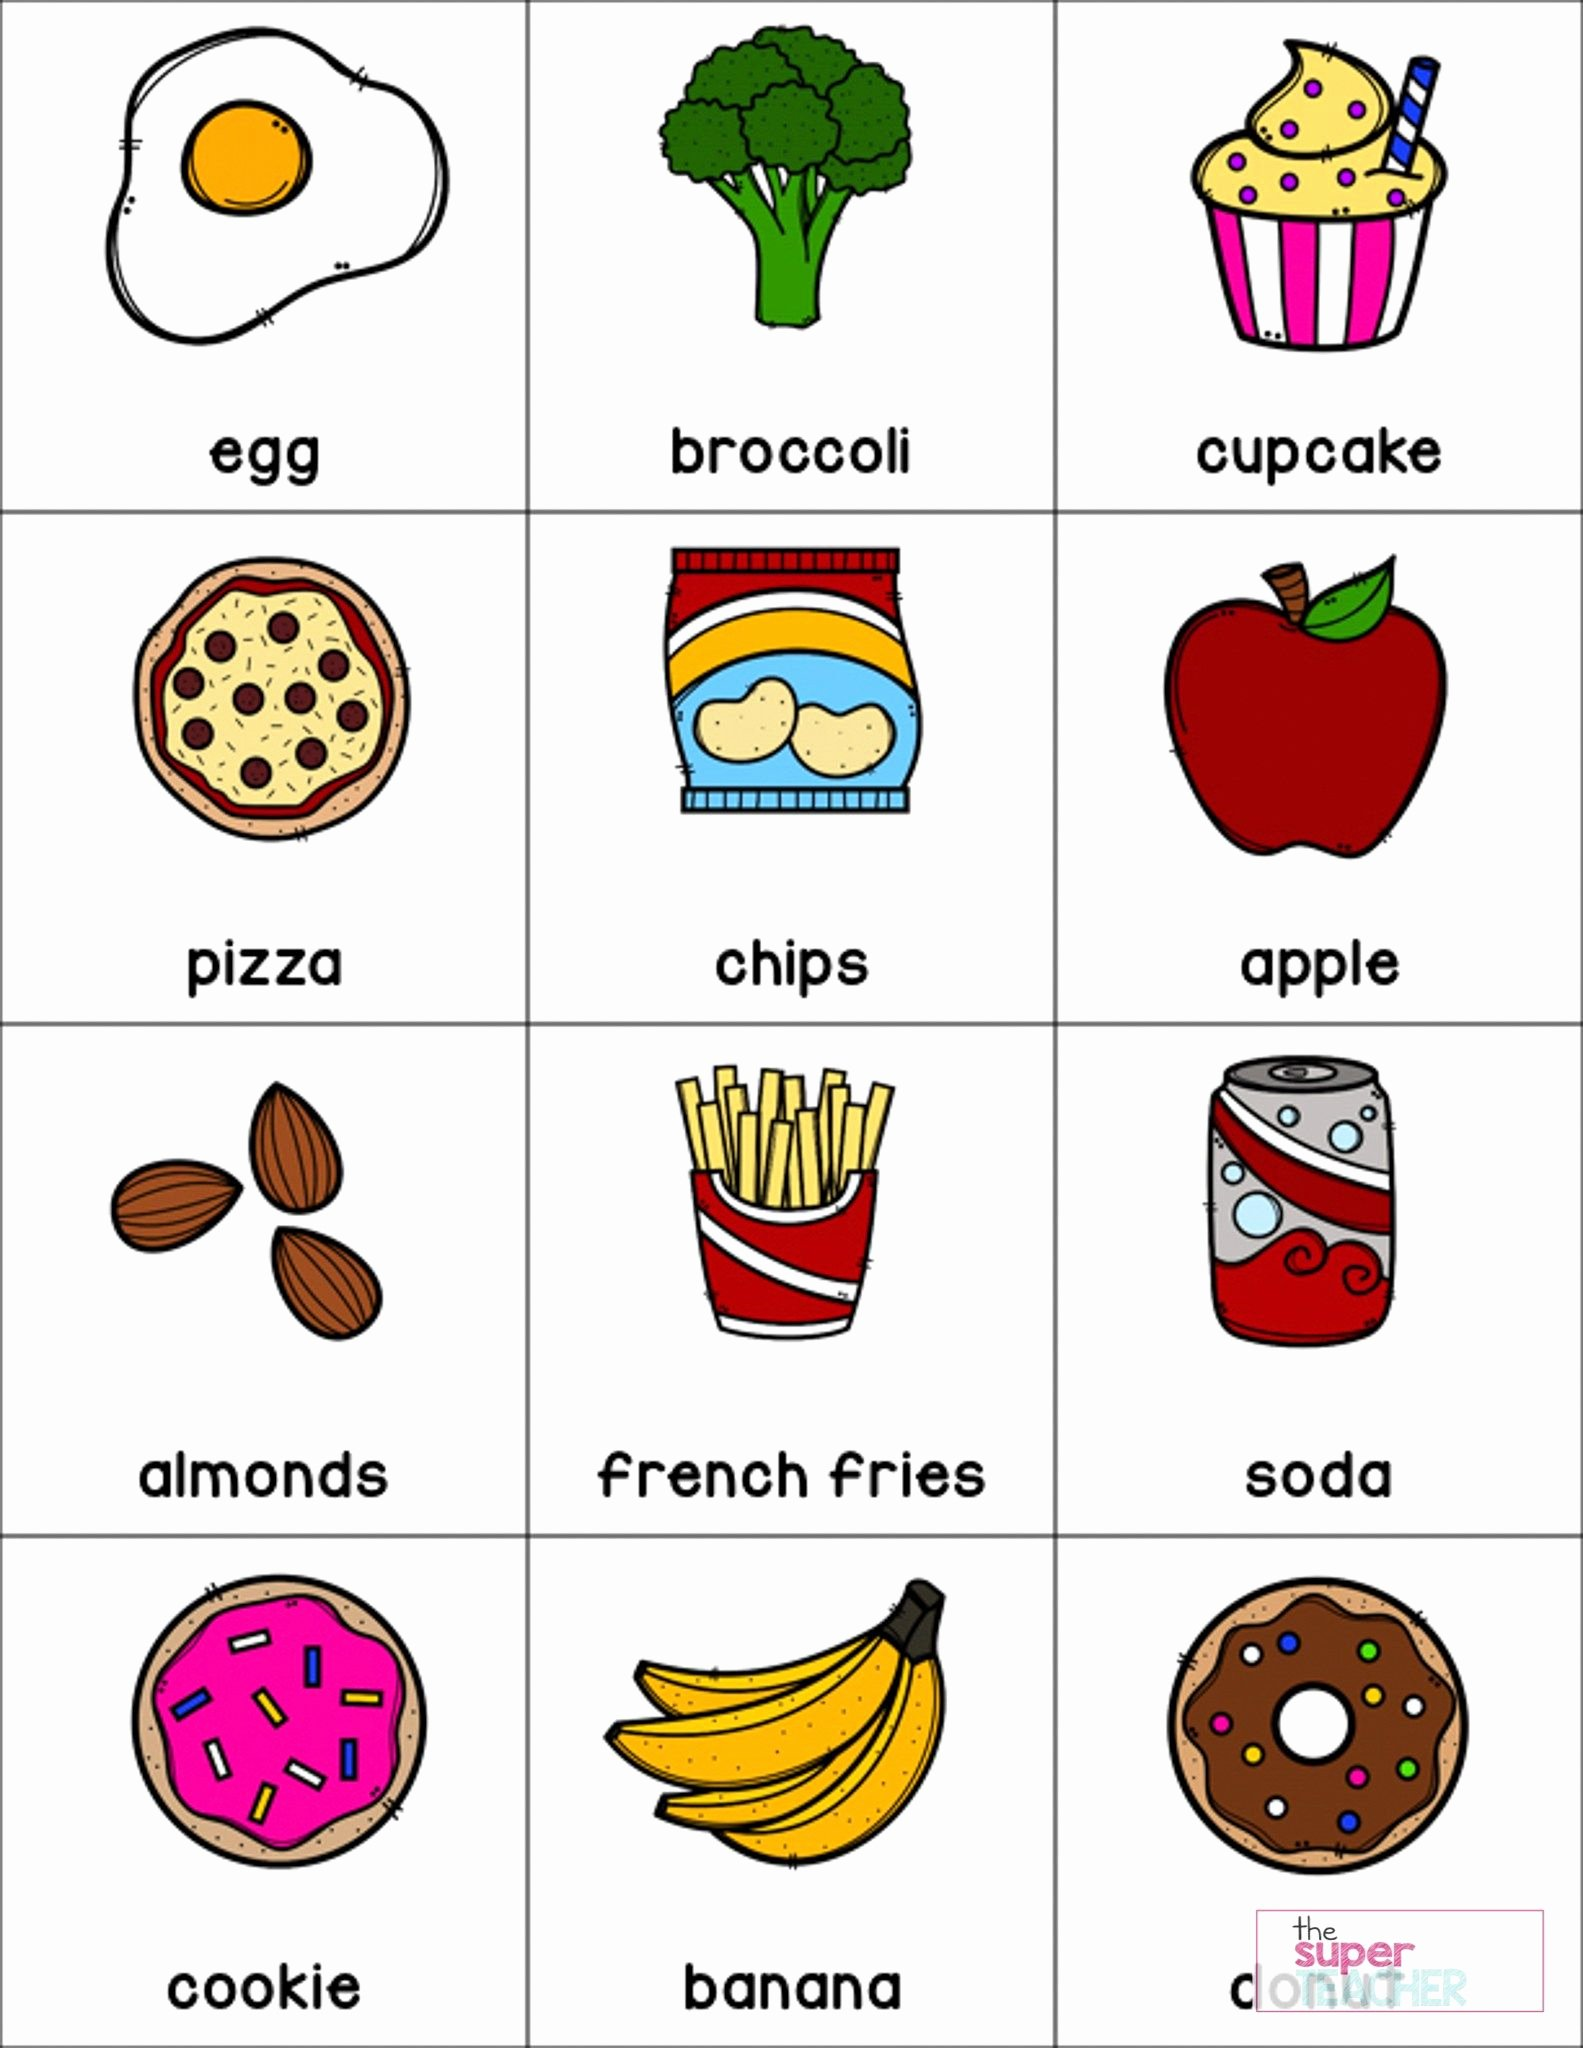 Healthy Foods Worksheets for Preschoolers Kids Healthy Foods Worksheet Free and Unhealthy Junk Food